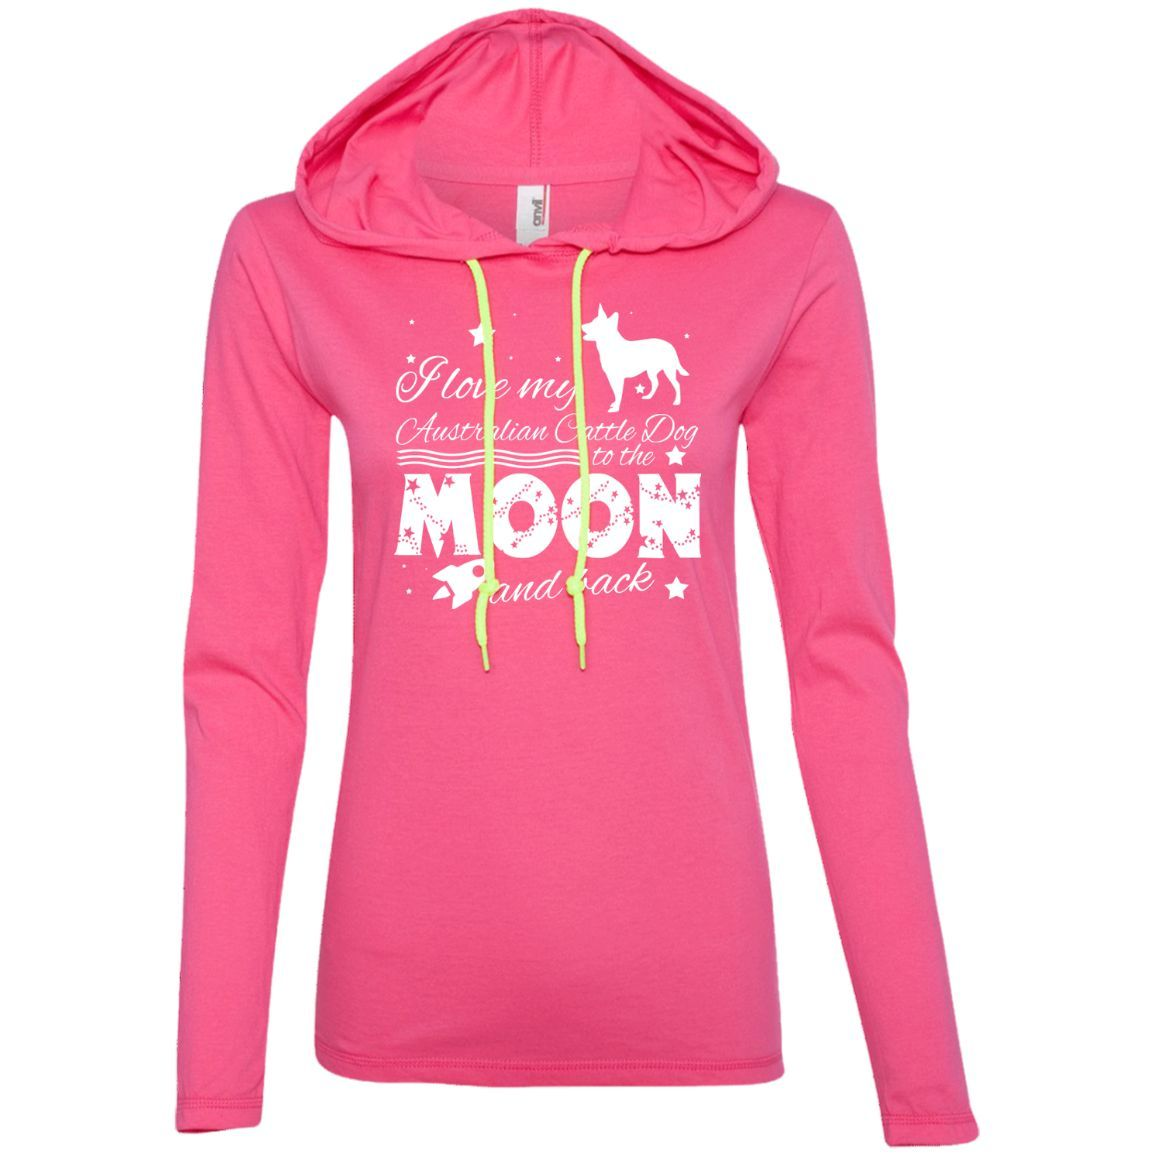 Love My Australian Cattle Dog To The Moon And Back Ladies Tee Shirt Hoodies